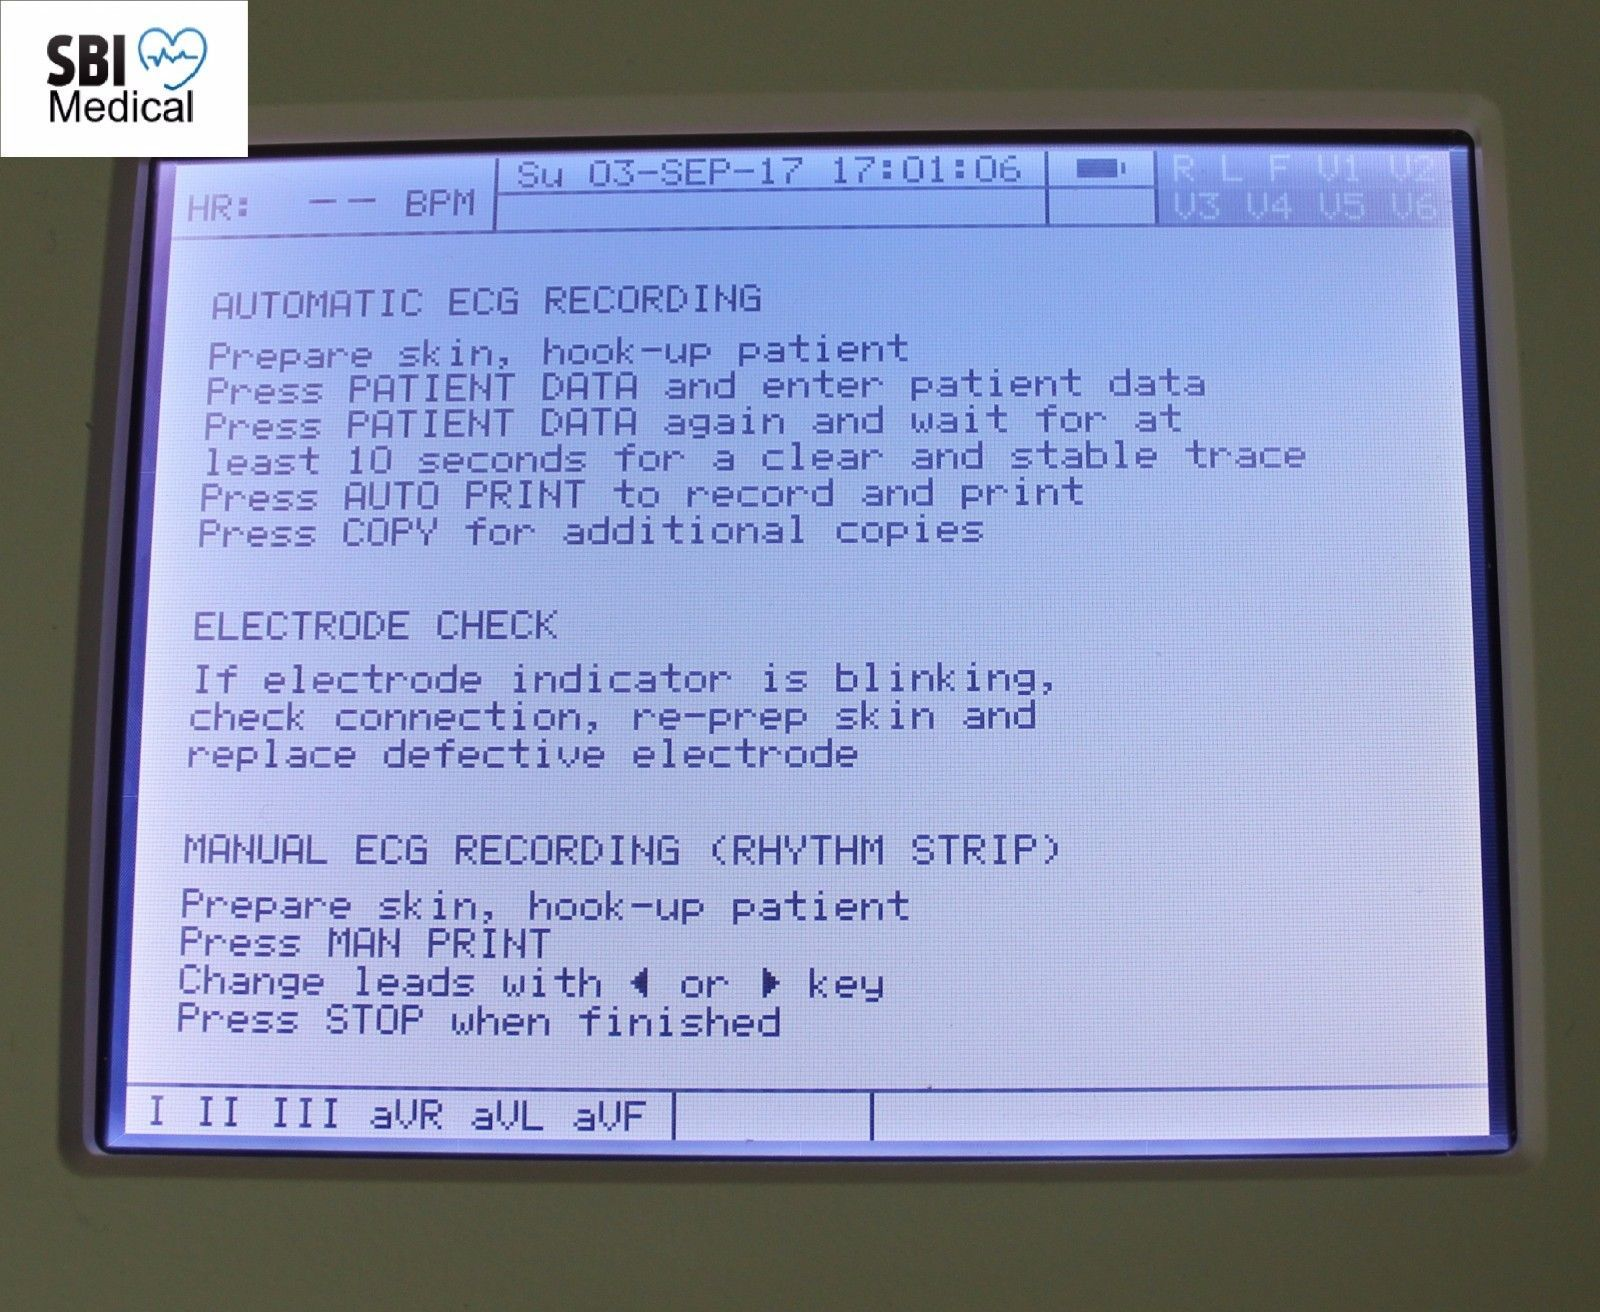 Schiller at 10 manual array schiller gt 200 plus interpretative ecg ekg and similar items rh bonanza com fandeluxe Choice Image